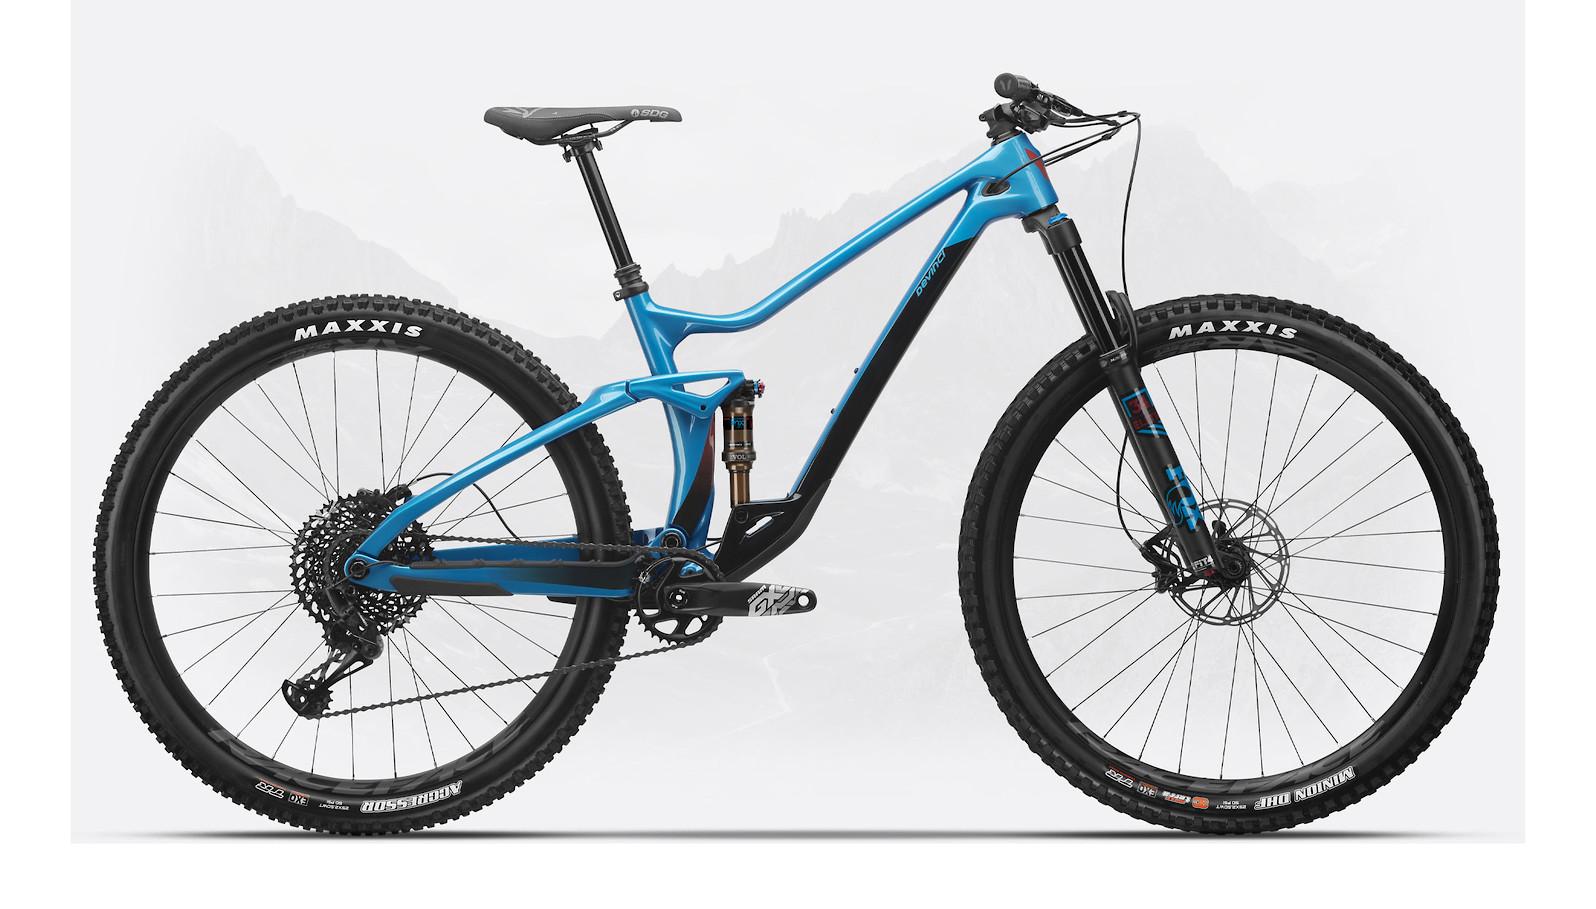 2020 Devinci Django Carbon 29 GX (Gloss Lunar Blue)